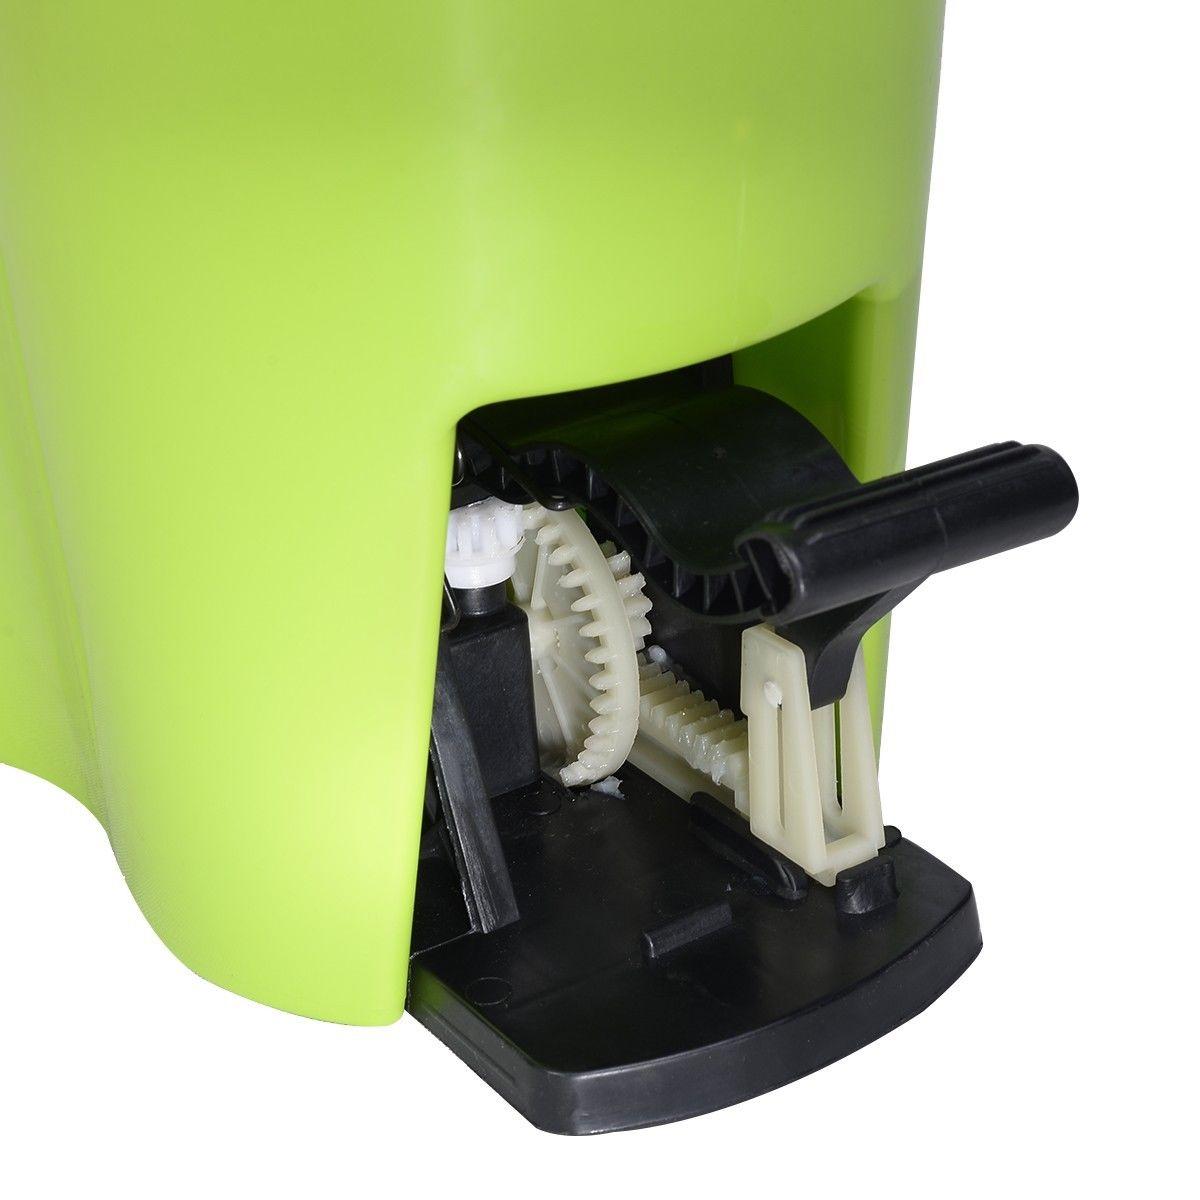 Magic Spin Mop Microfiber Spining W/Bucket 2 Heads 360° Rotating Floor Mop Easy